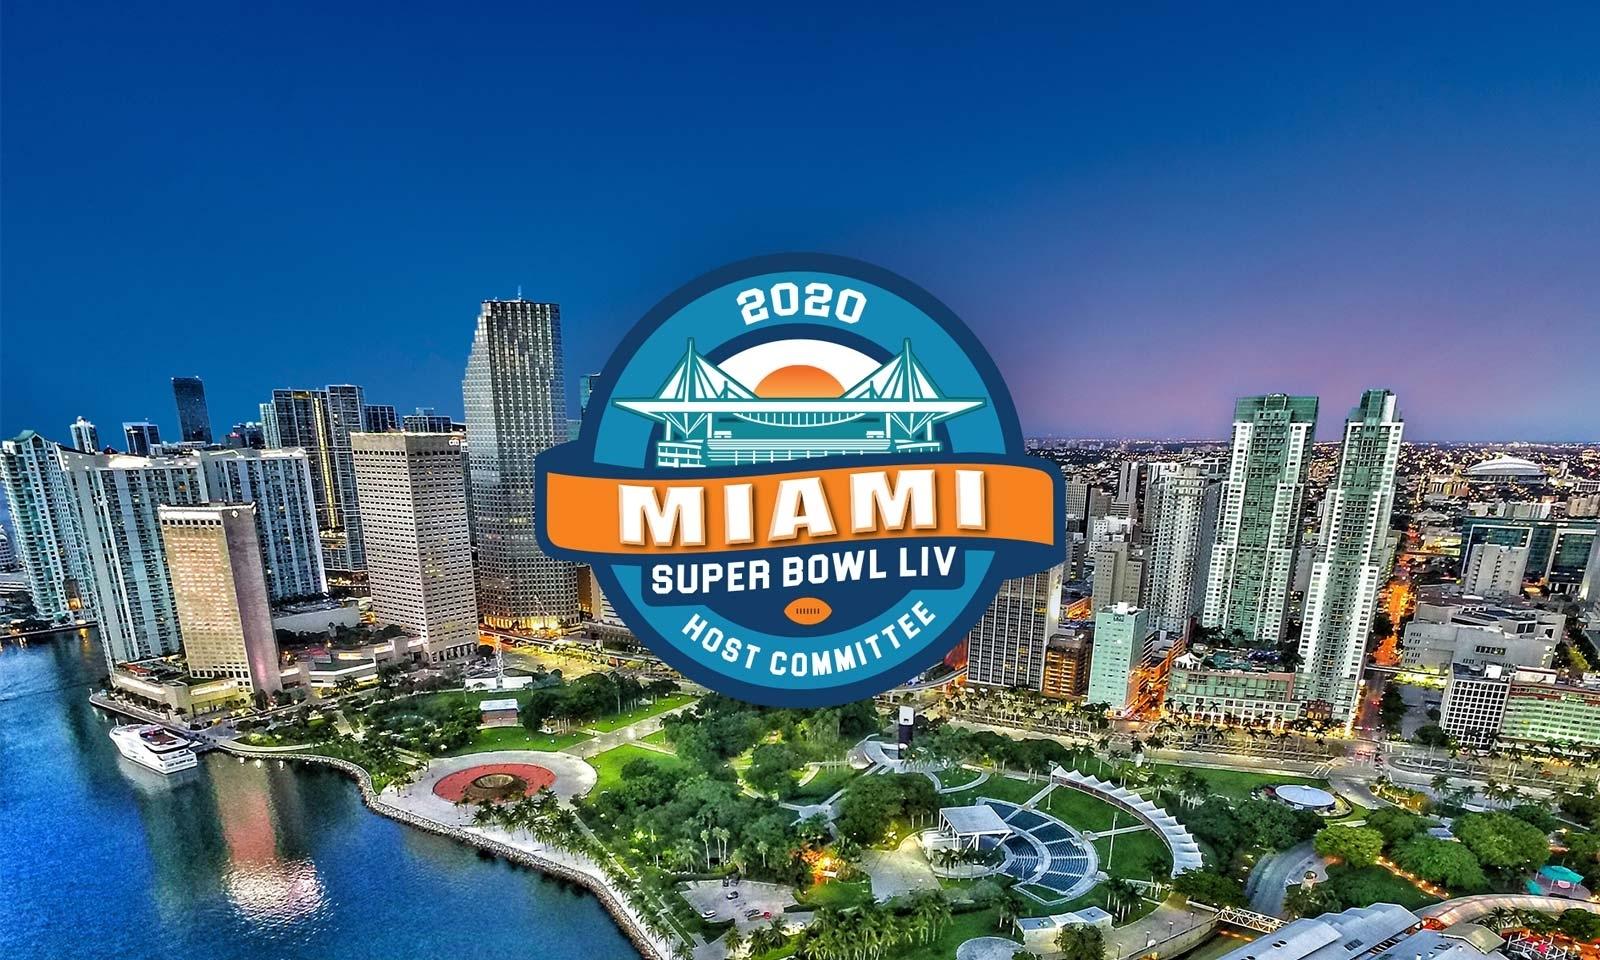 Advantage Selected For Miami Super Bowl Host Committee'S regarding Miami Super Bowl 2020 Hotels